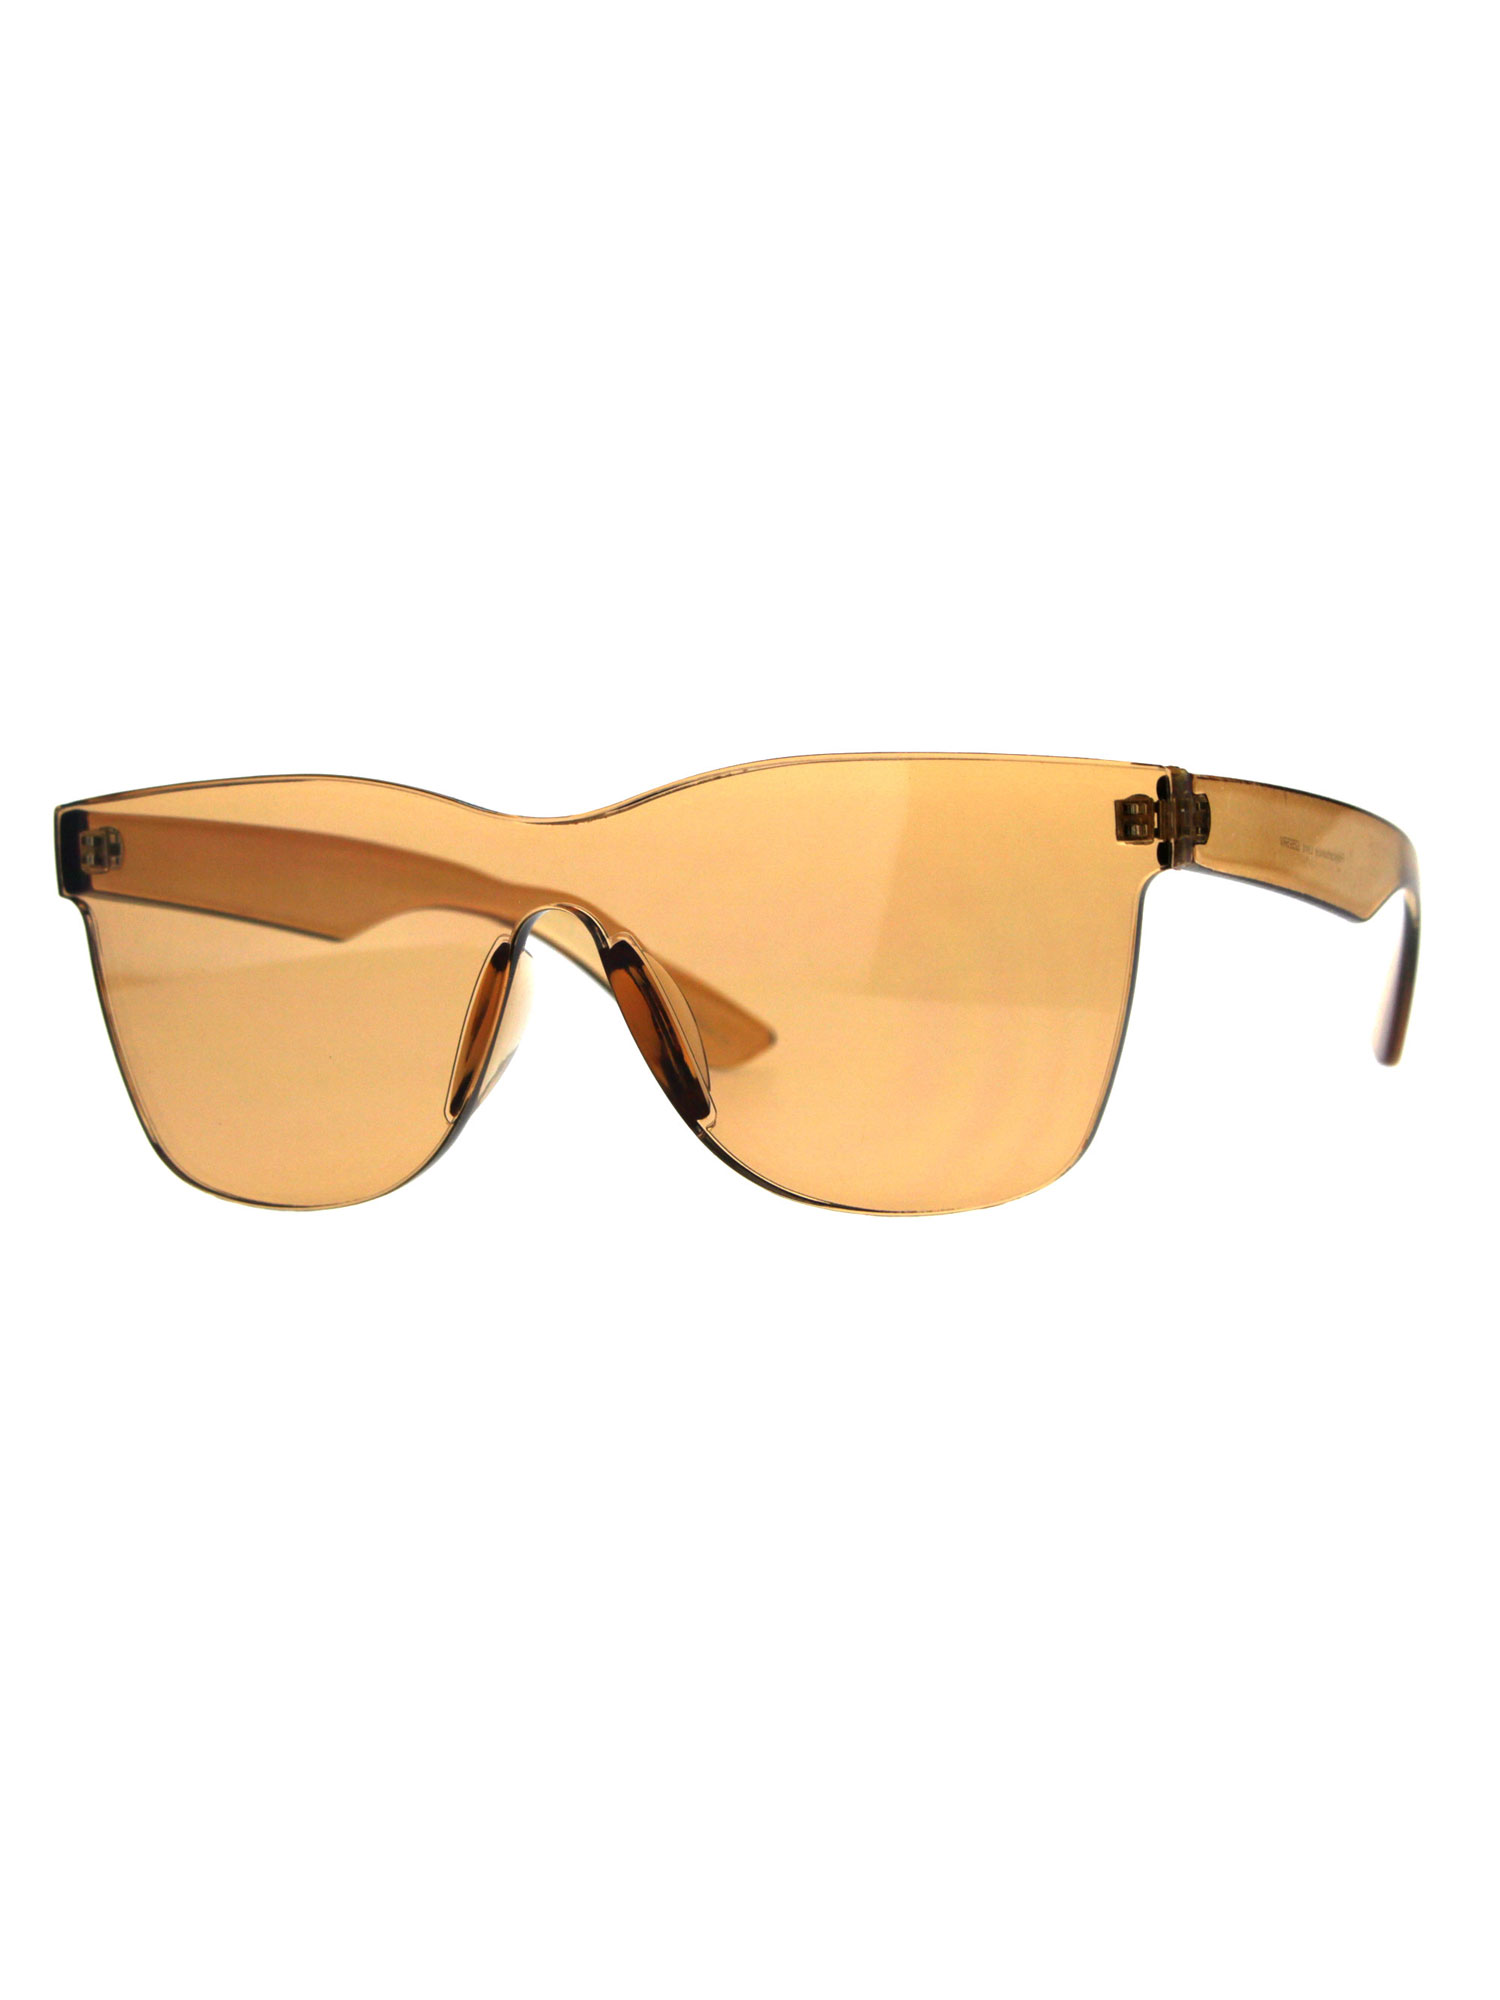 Mens Geeky Hipster Shield Nerd Mirrored Plastic Horn Rim Sunglasses